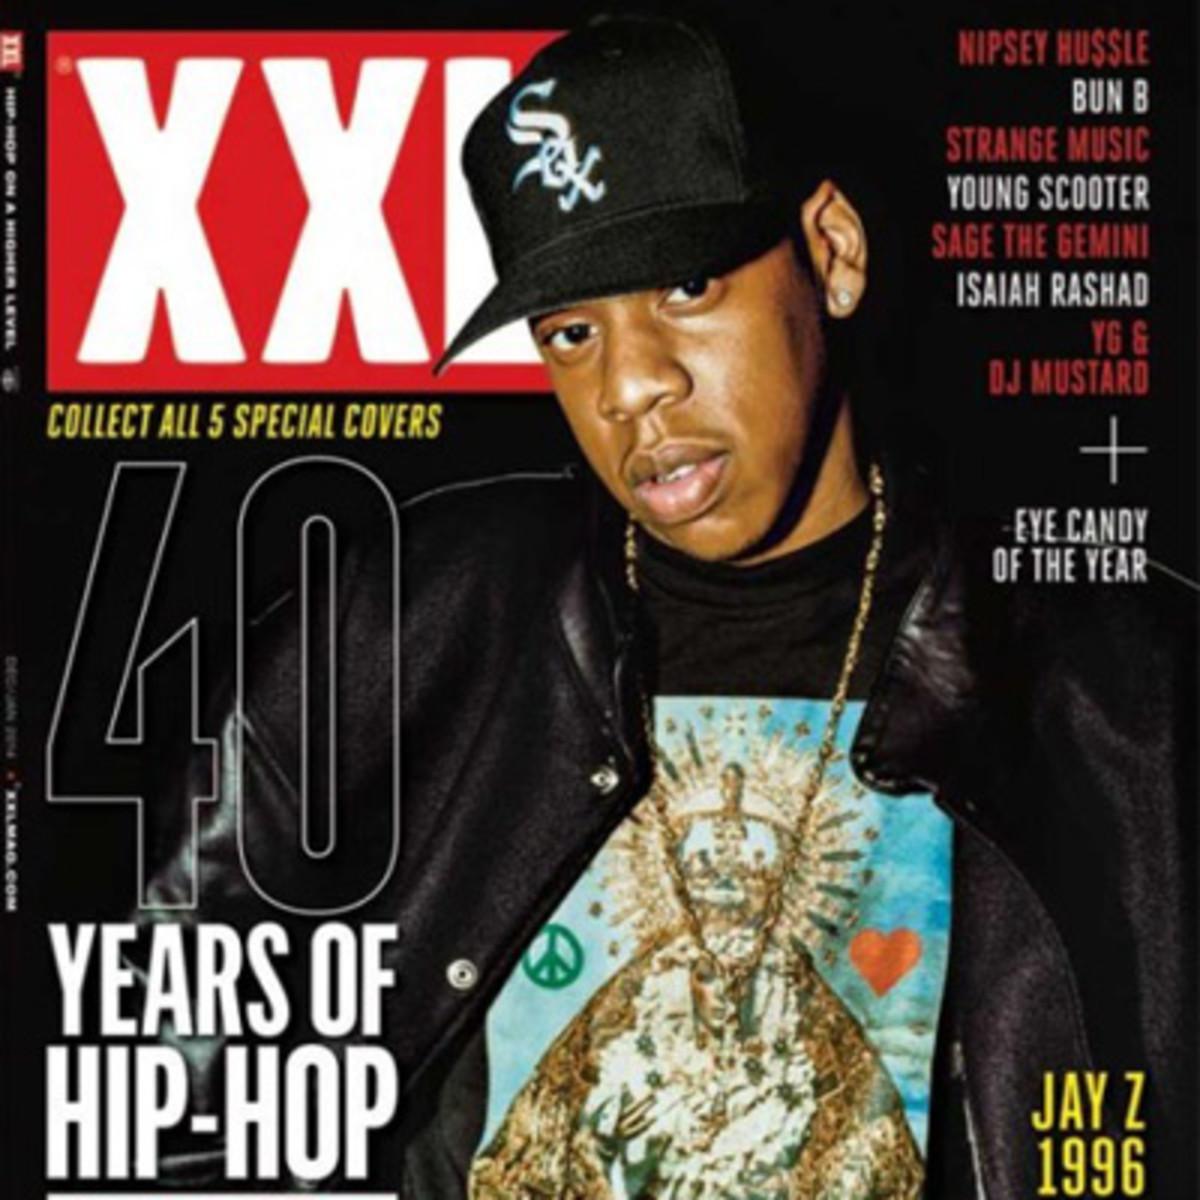 xxl-magazine.jpg